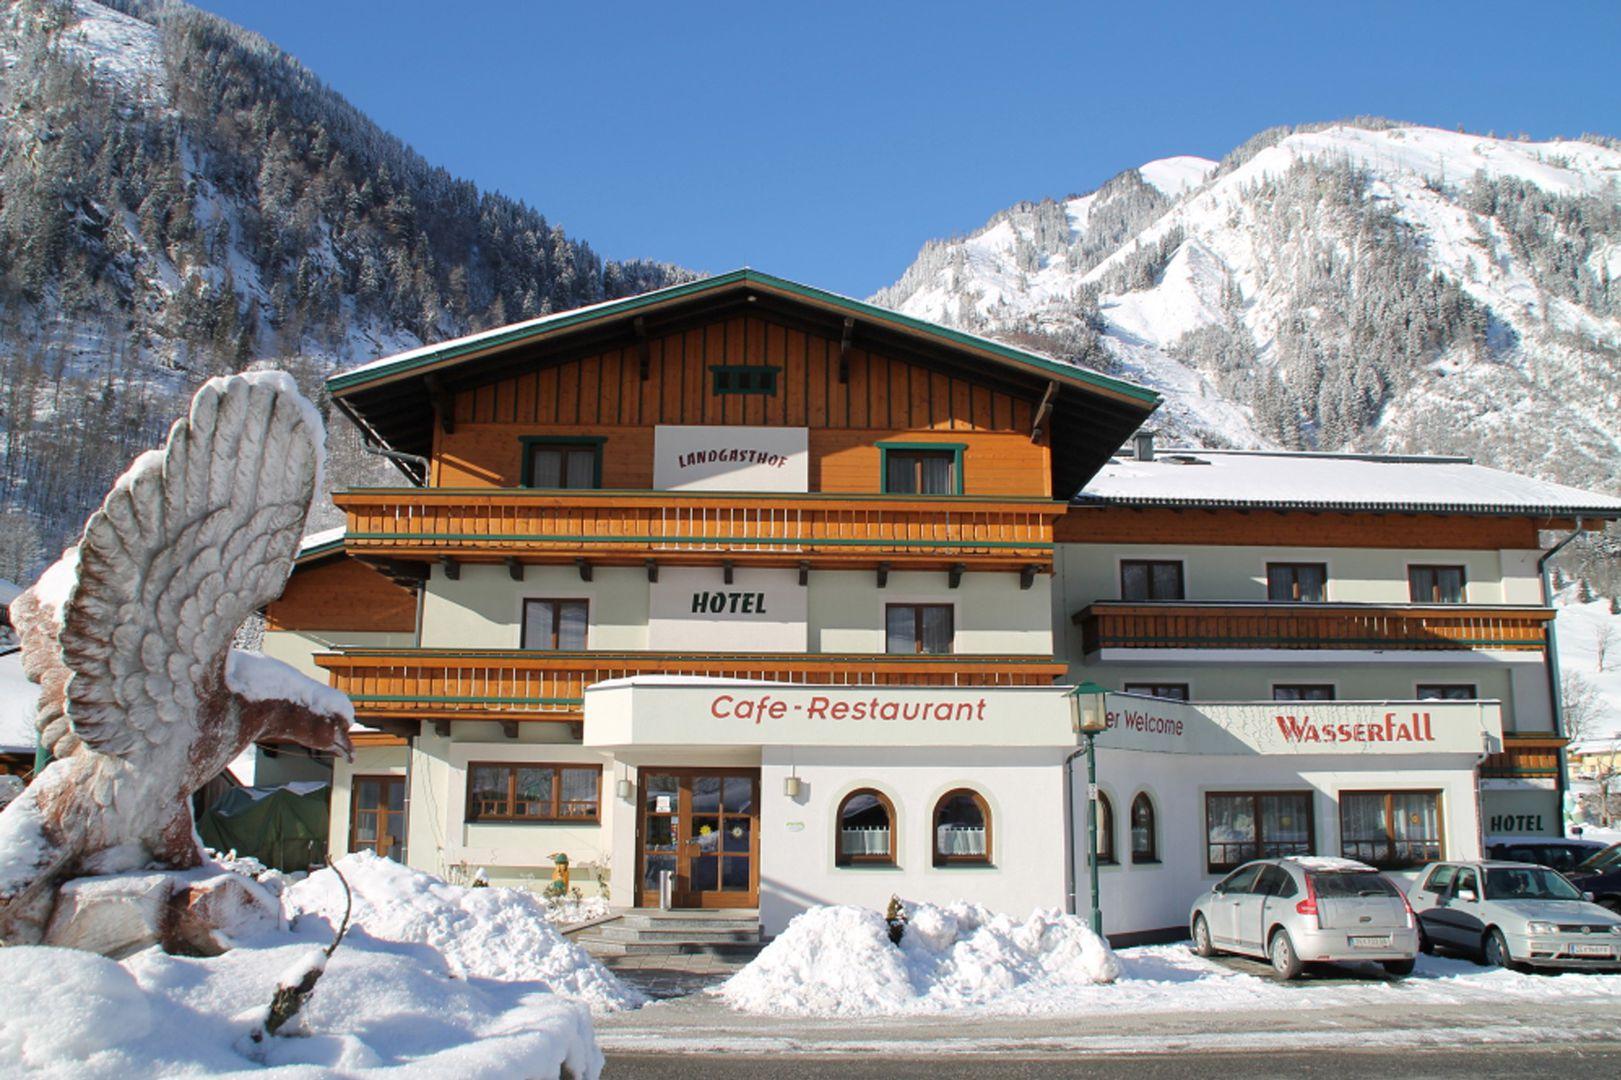 Hotel Landgasthof Wasserfall